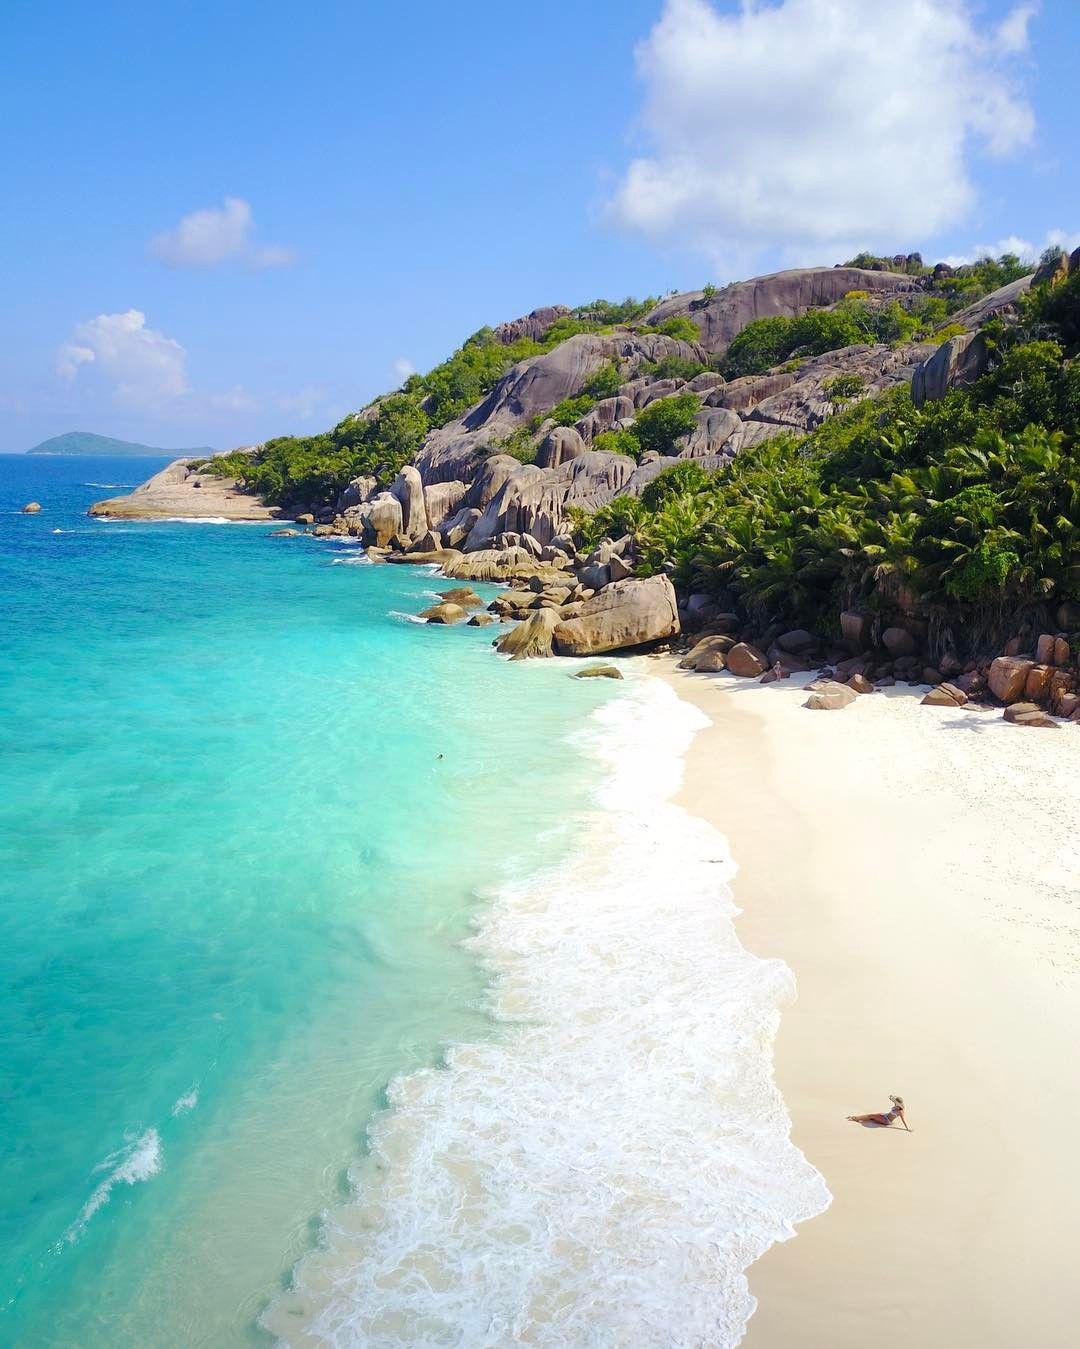 Seychelles Beach: BIG SISTER ISLAND ALLE SEYCHELLES